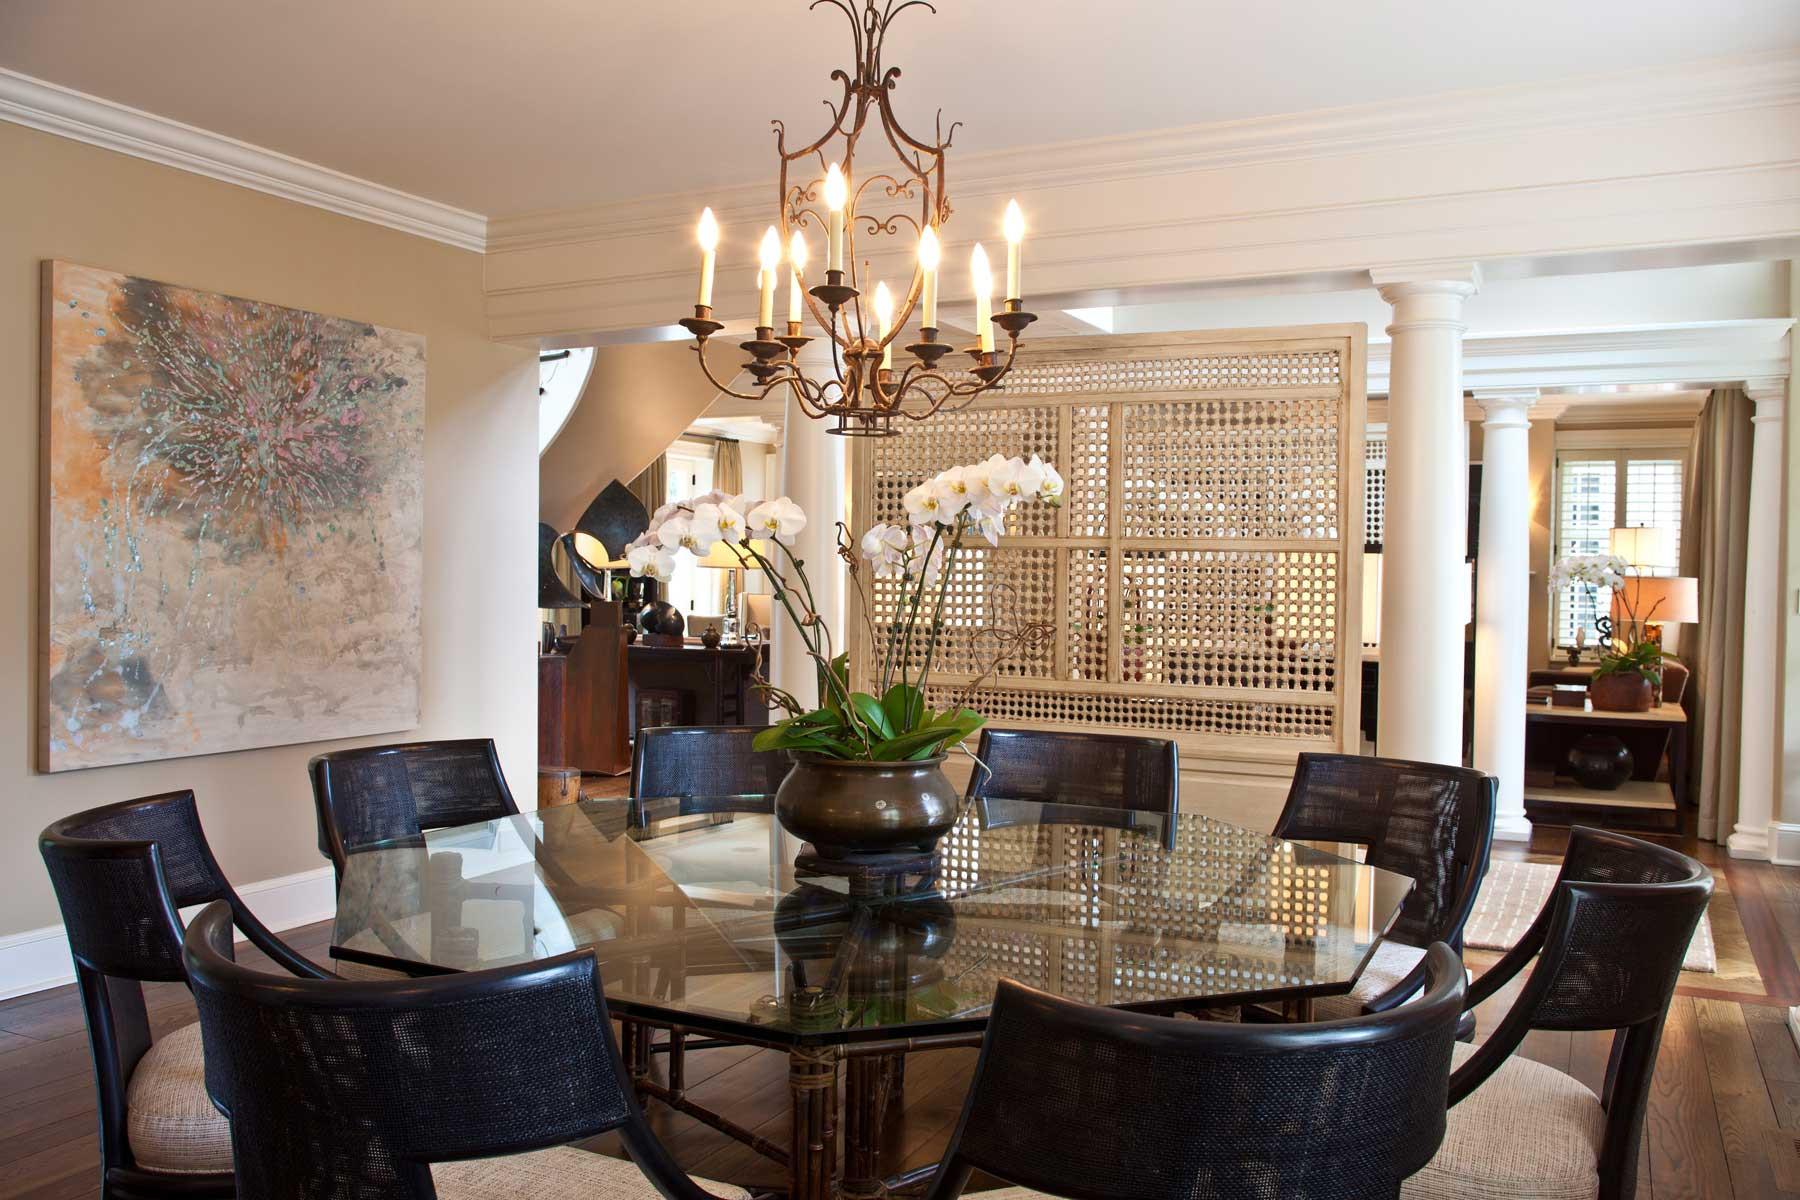 06-diningroom-a